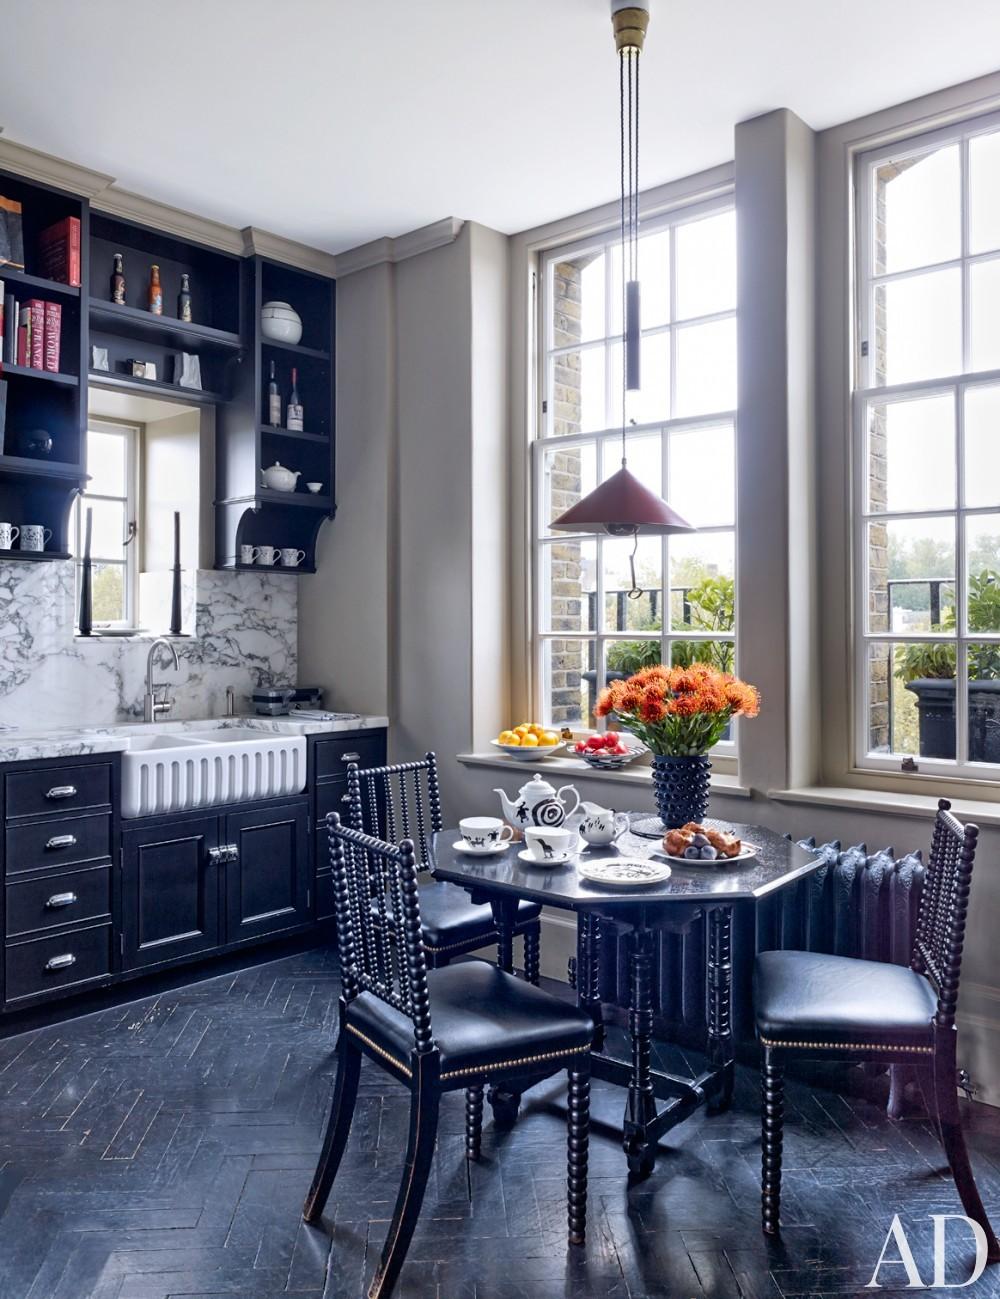 Modern Kitchen by Veere Grenney in London, UK